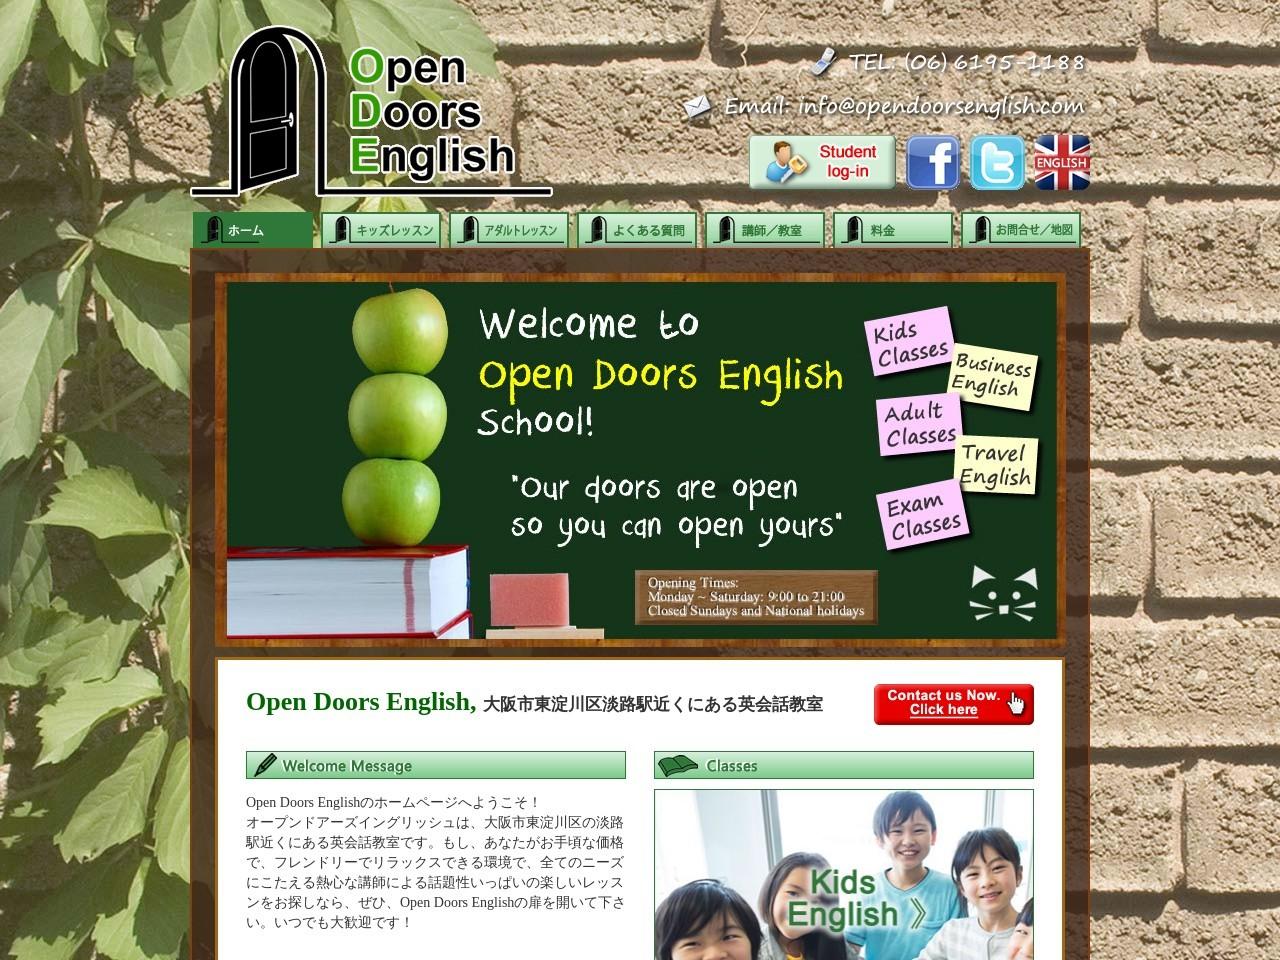 OpenDoorsEnglish